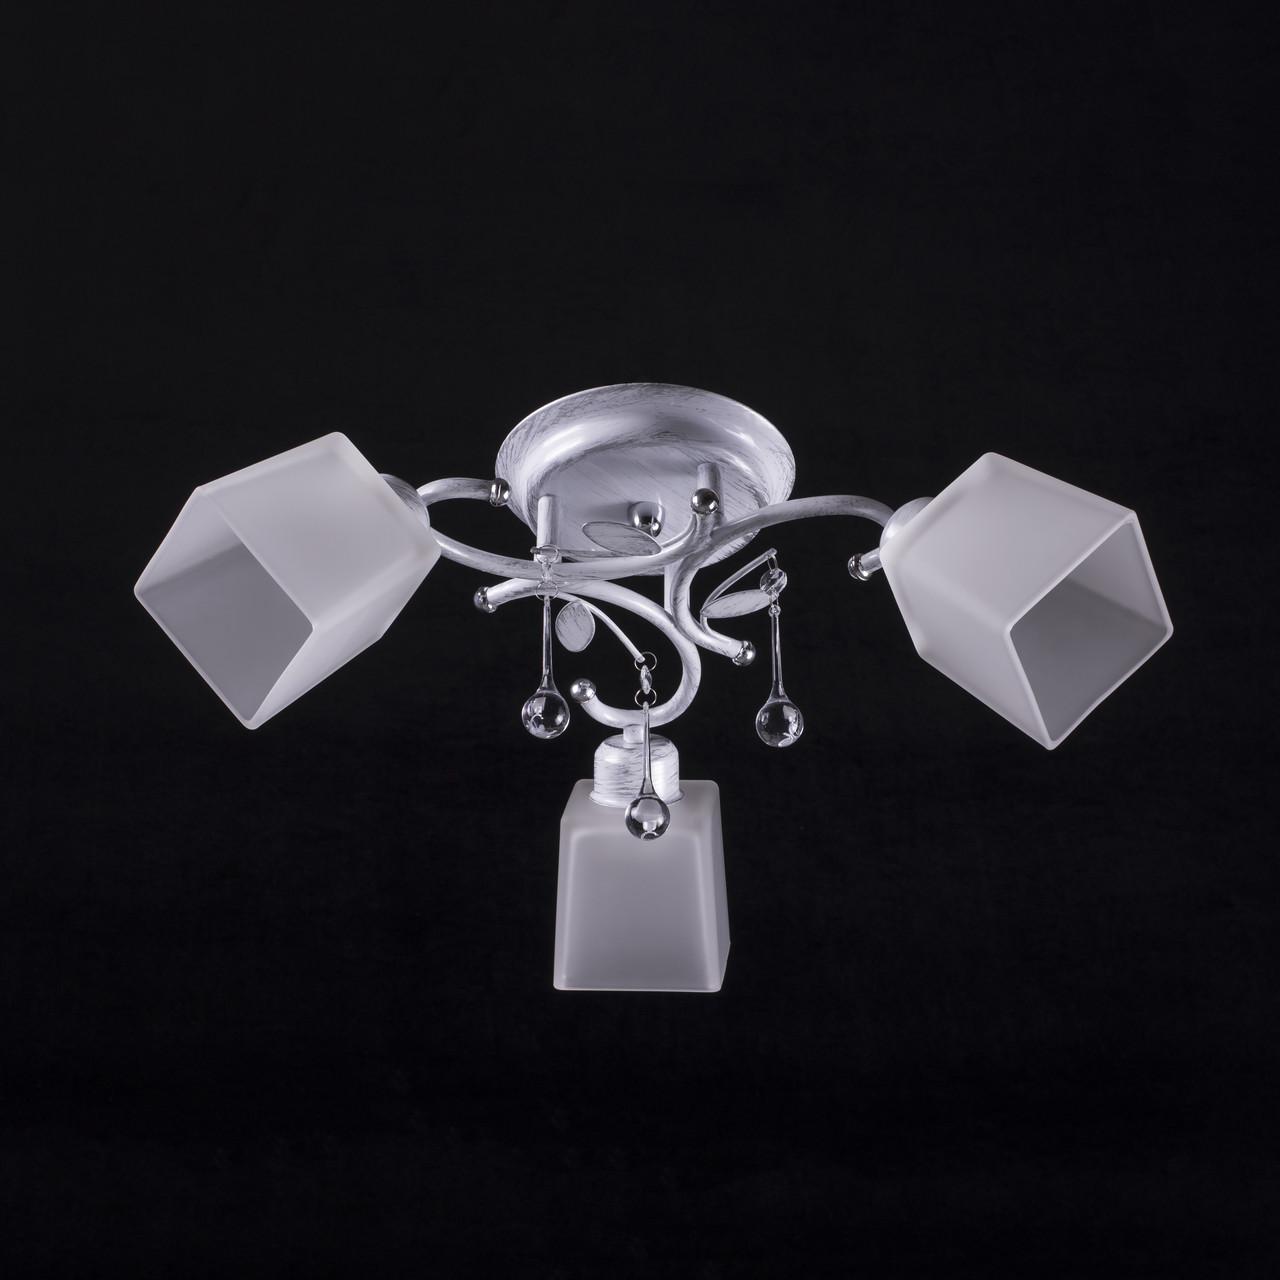 Люстра на 3 лампочки (белая патина). P3-37395/3C/TS+WT